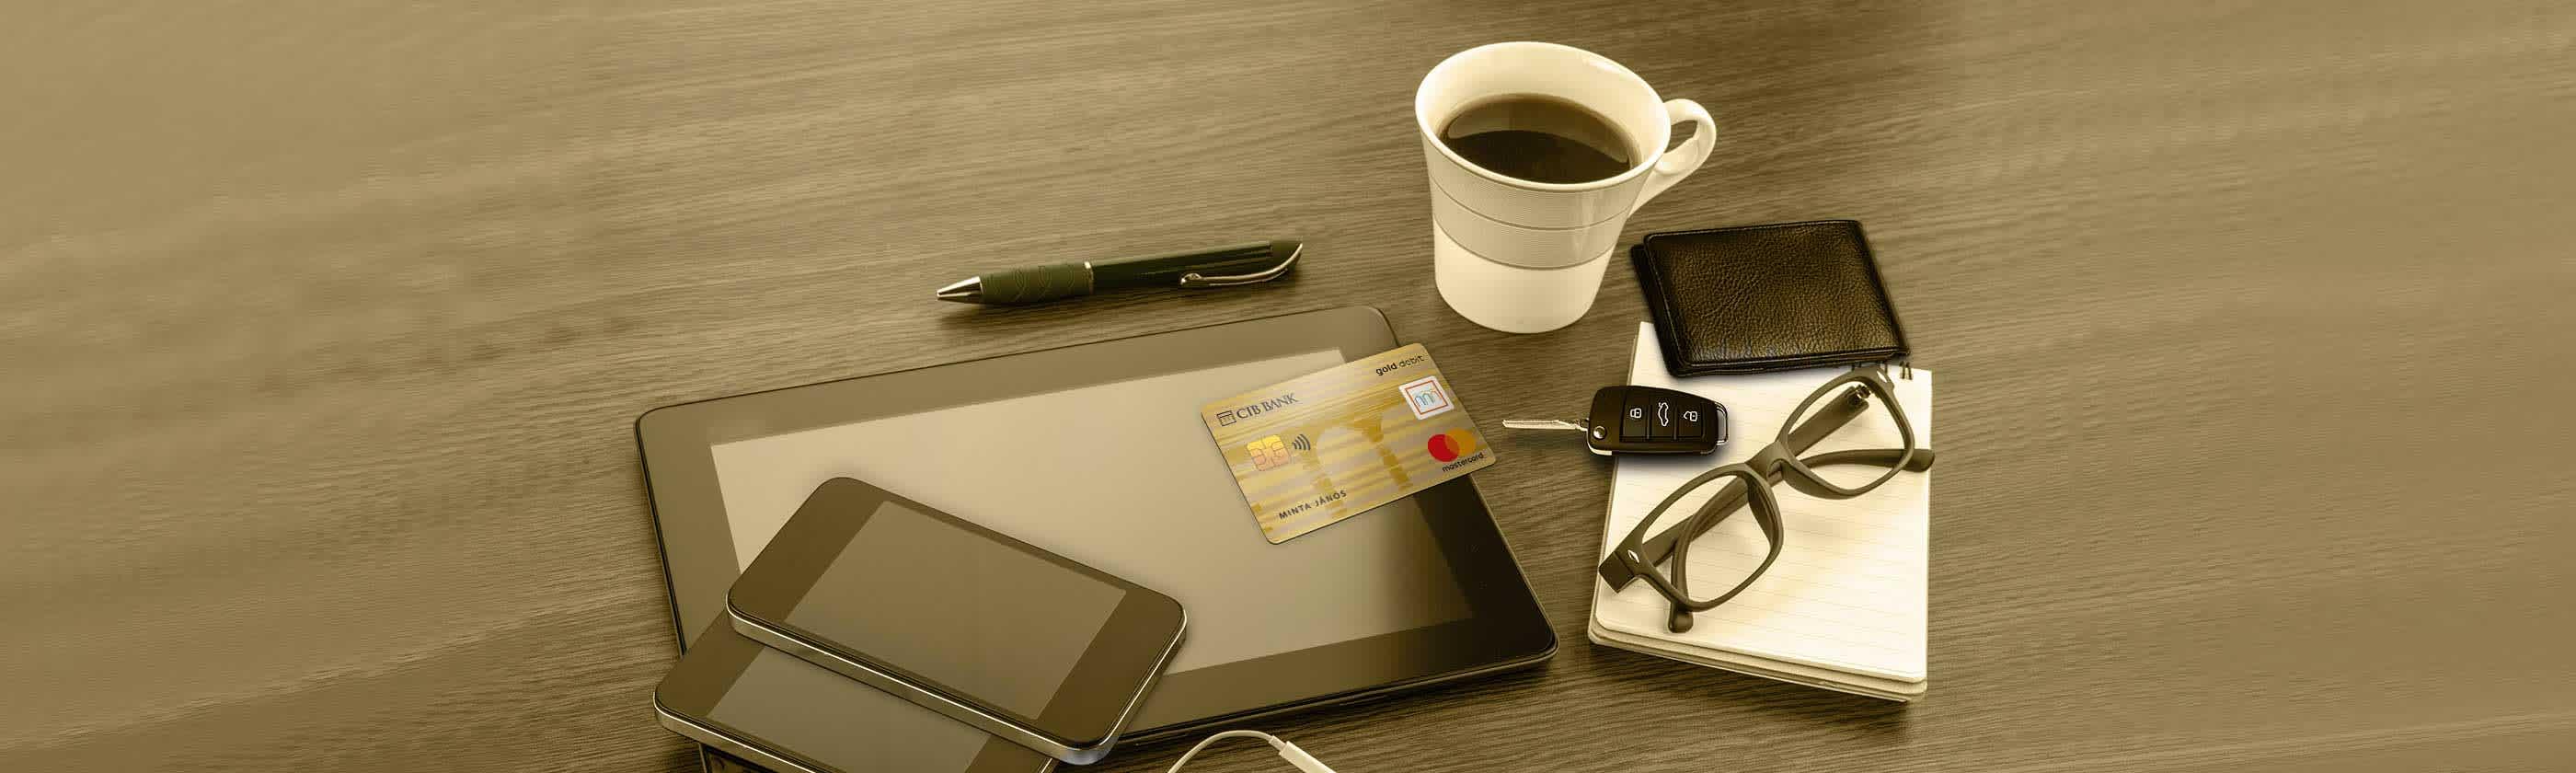 CIB MasterCard Gold Debit Bank Card